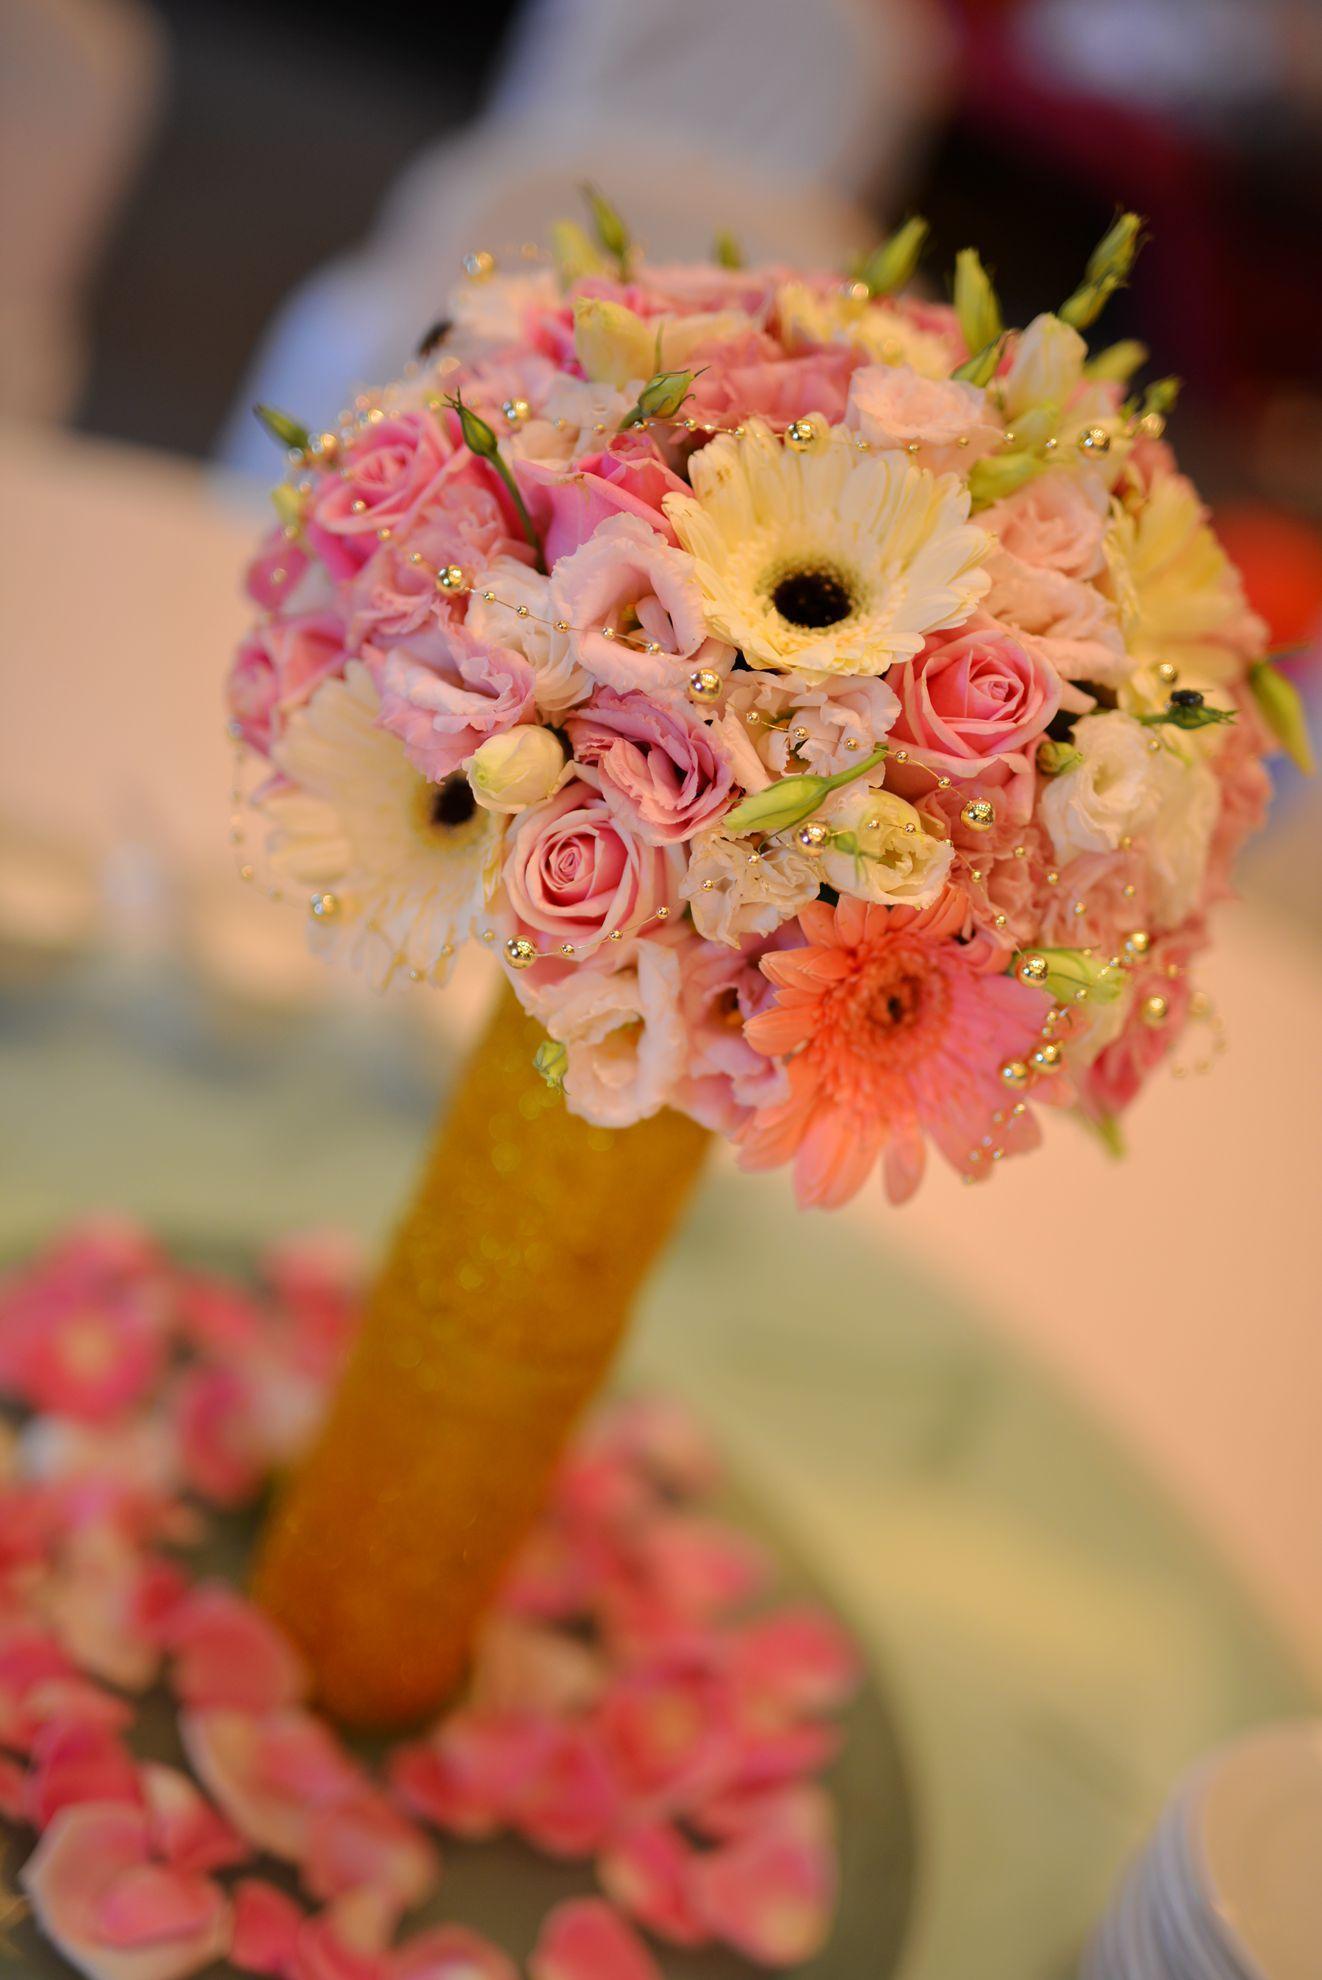 Home legato floral design dear flower lovers izmirmasajfo